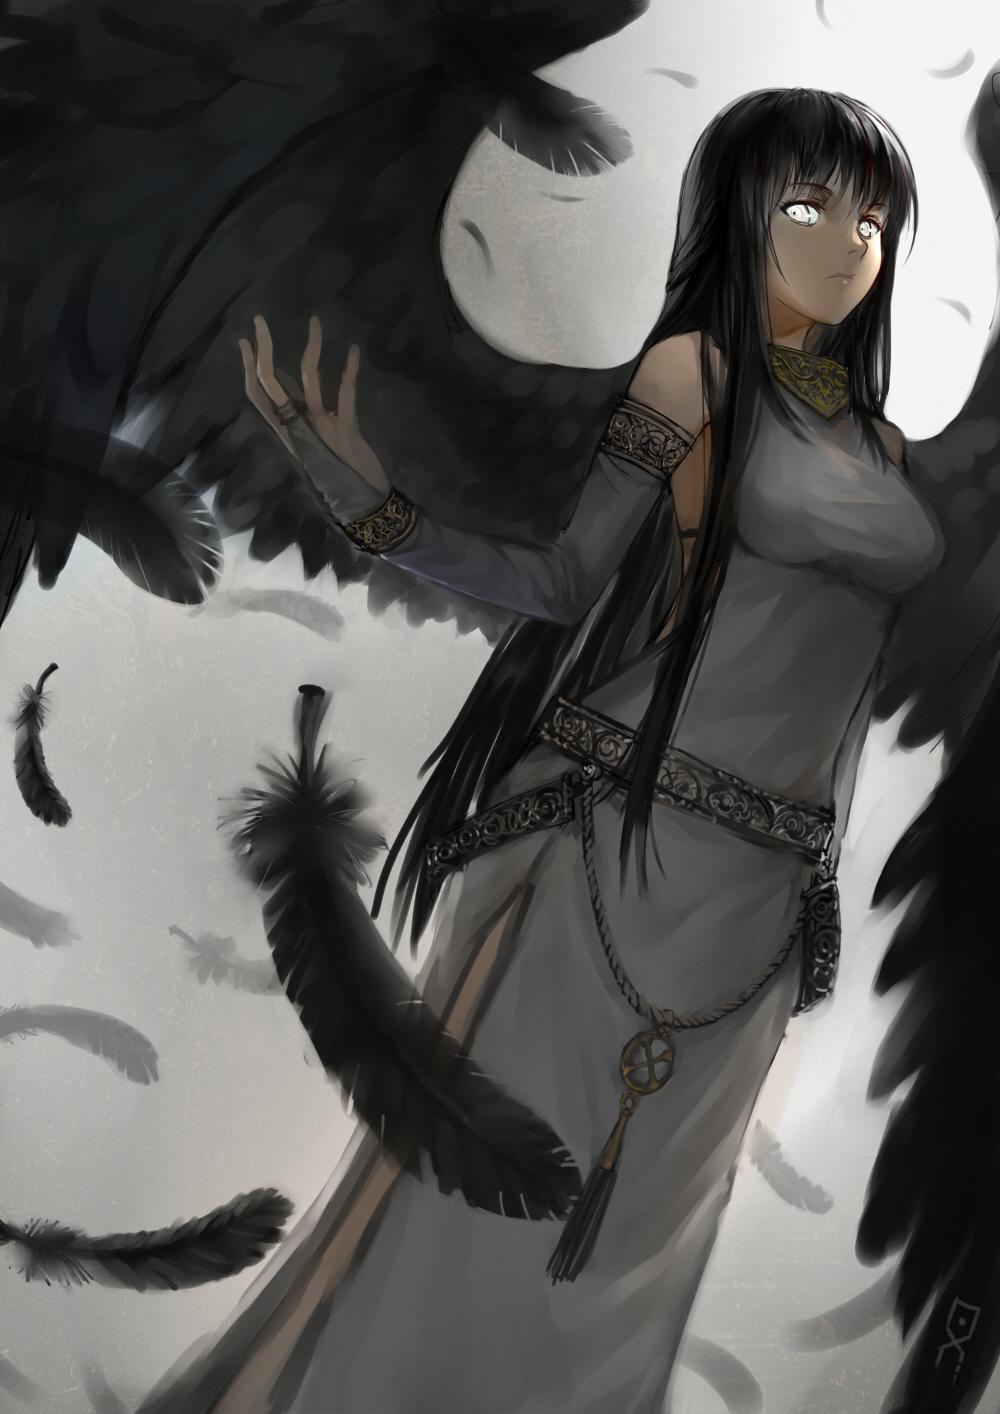 Mabinogi, Mobile Wallpaper - Zerochan Anime Image Board